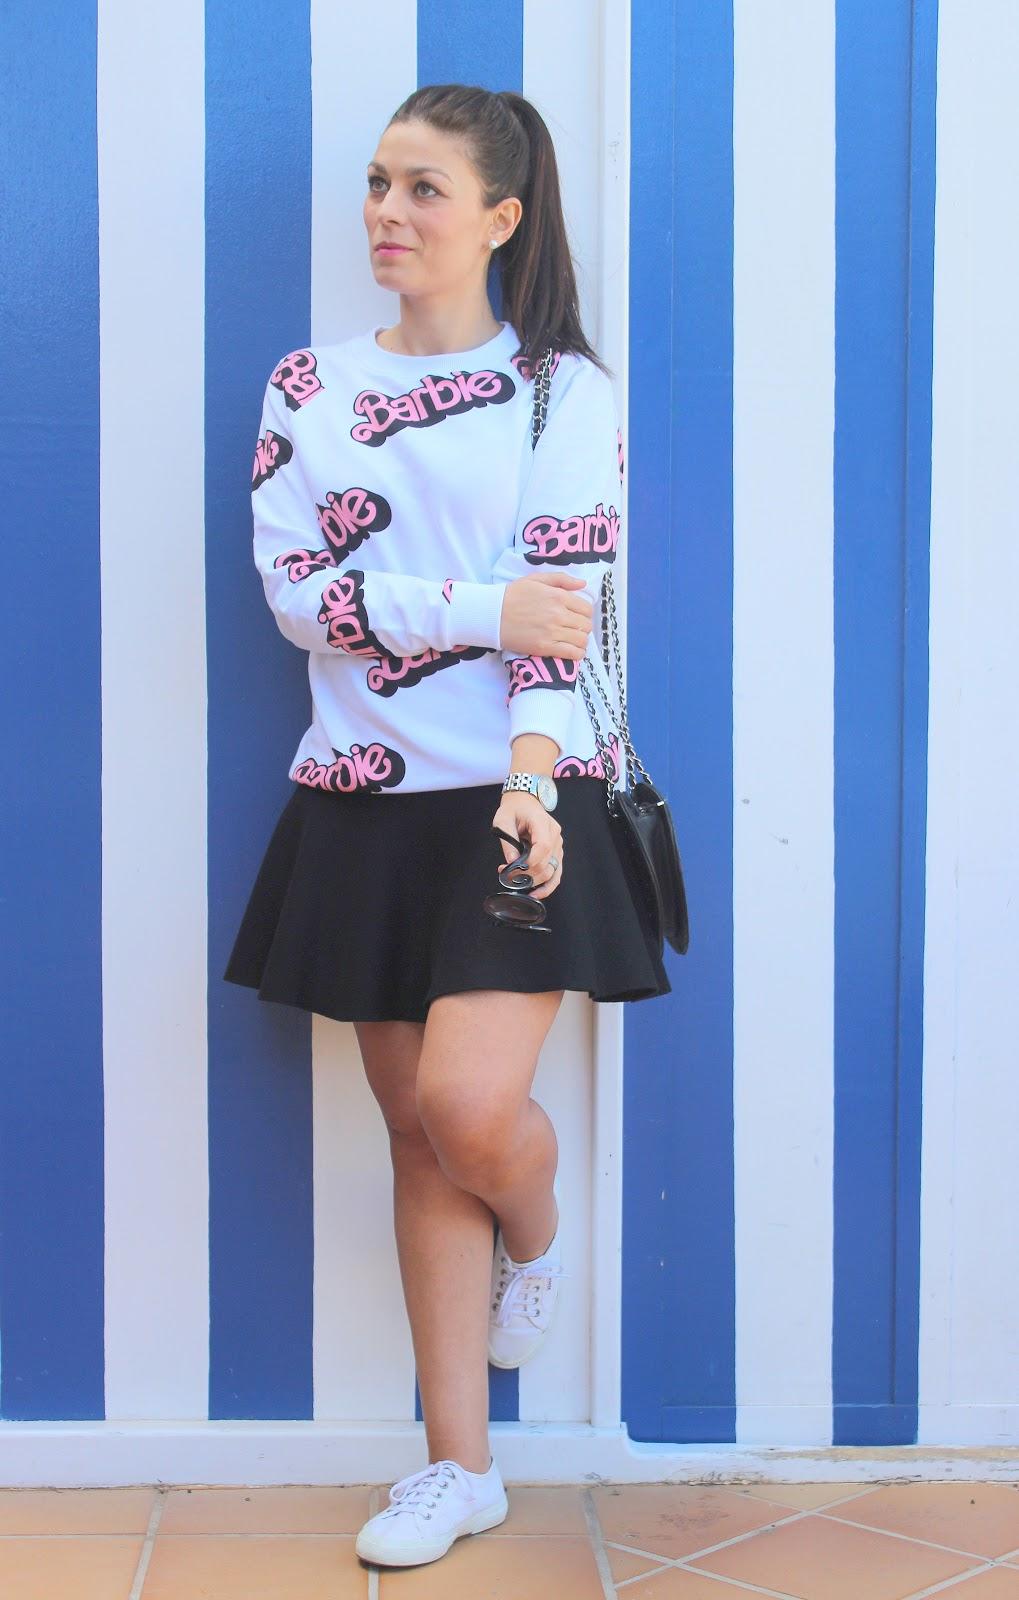 Barbie_Girl_The_Pink_Graff_07